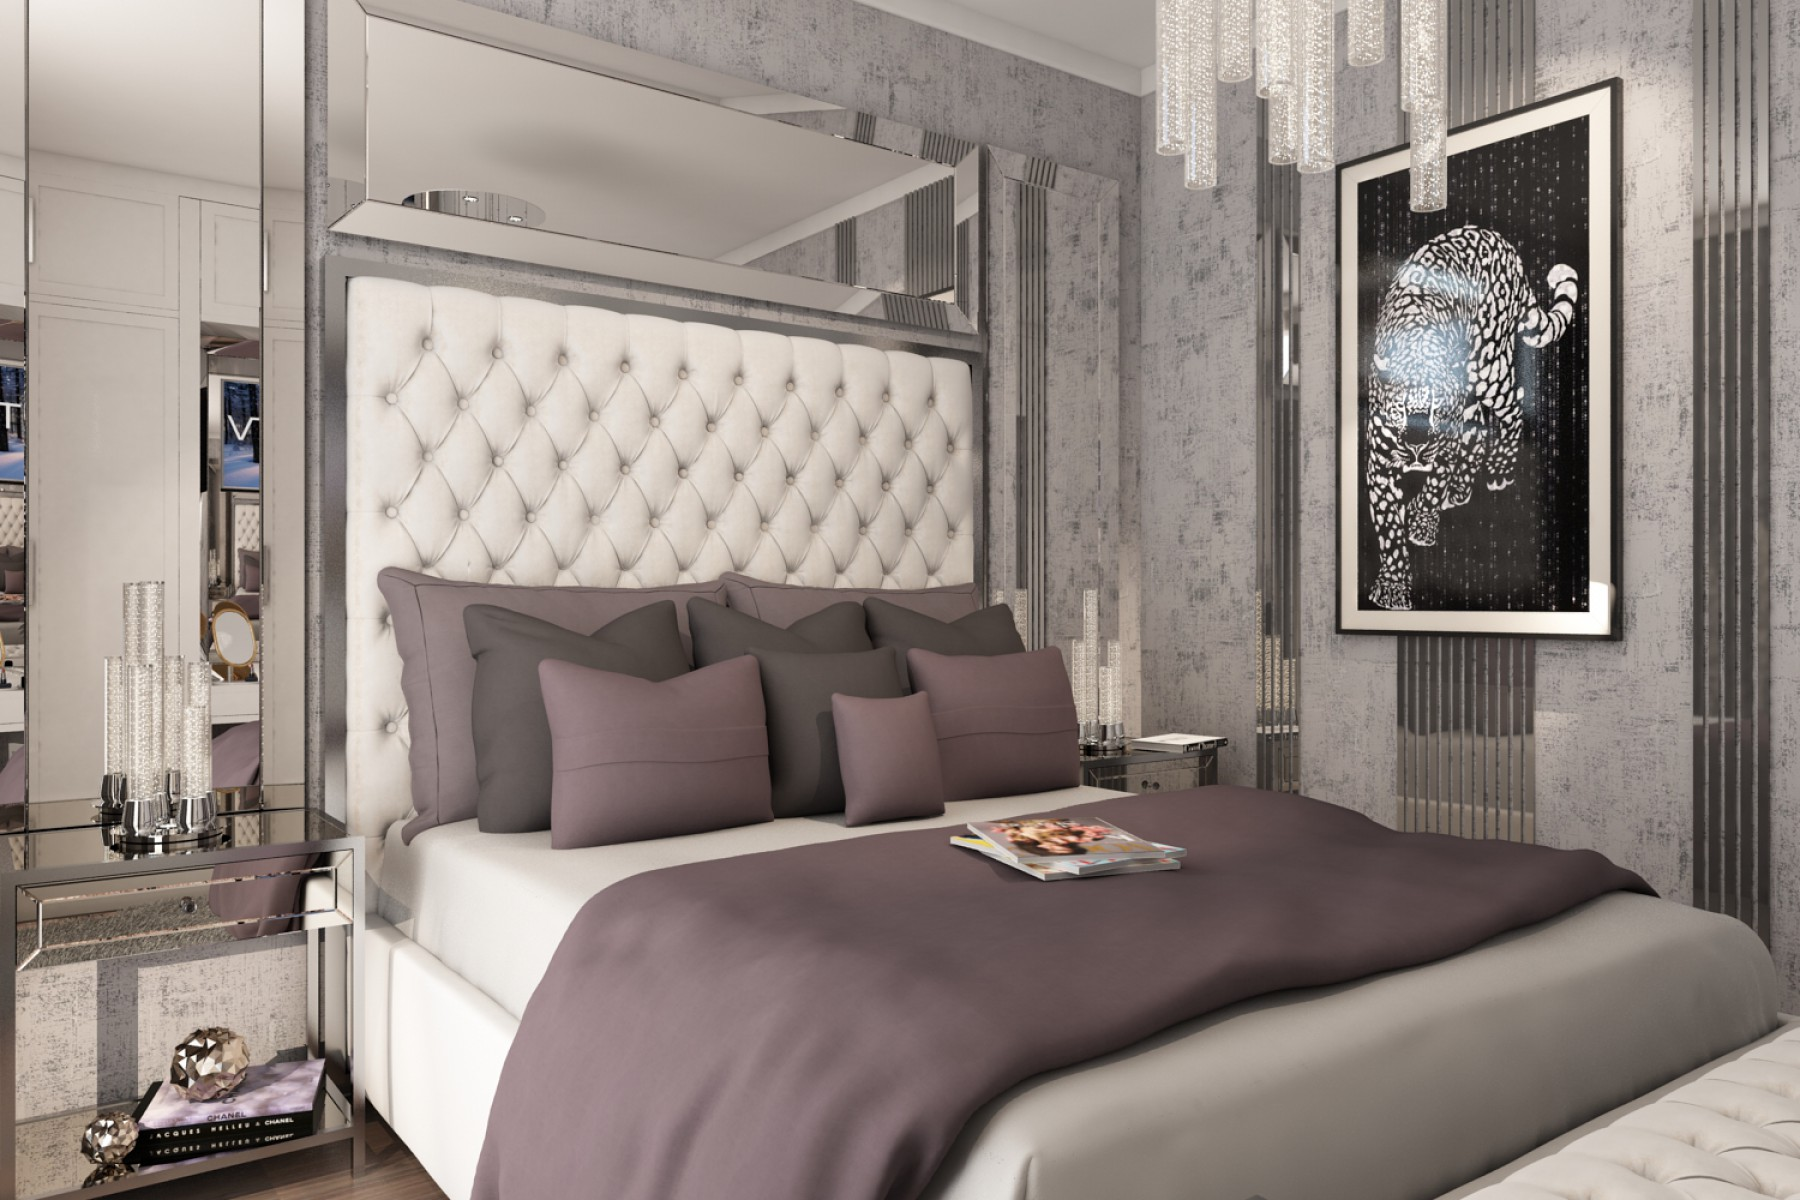 Brıga Towers Elçin Bey Yatak Odası Rusya